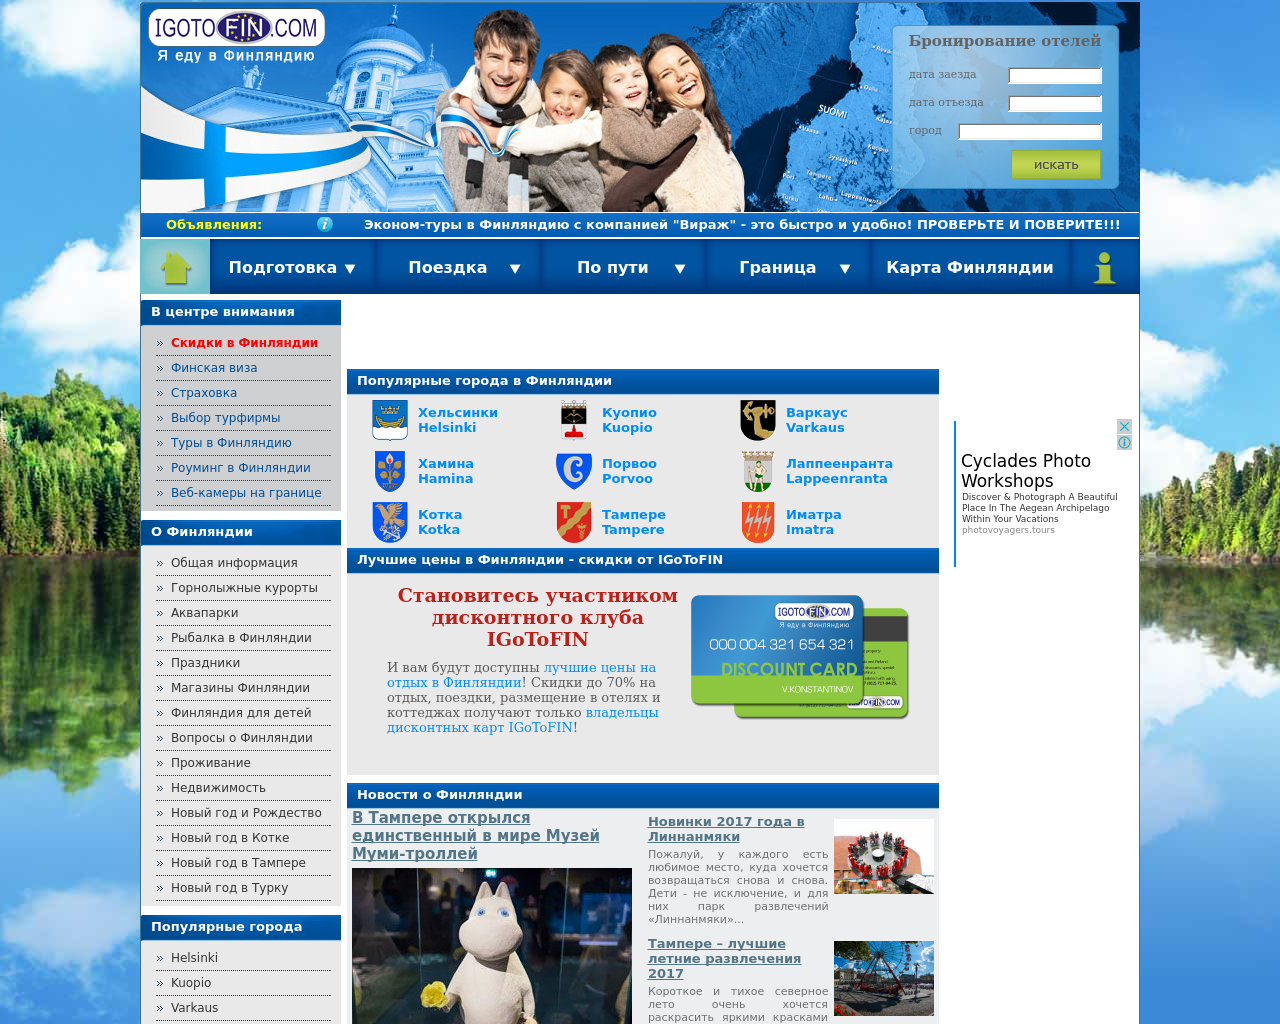 IGoToFIN-Advertising-Reviews-Pricing